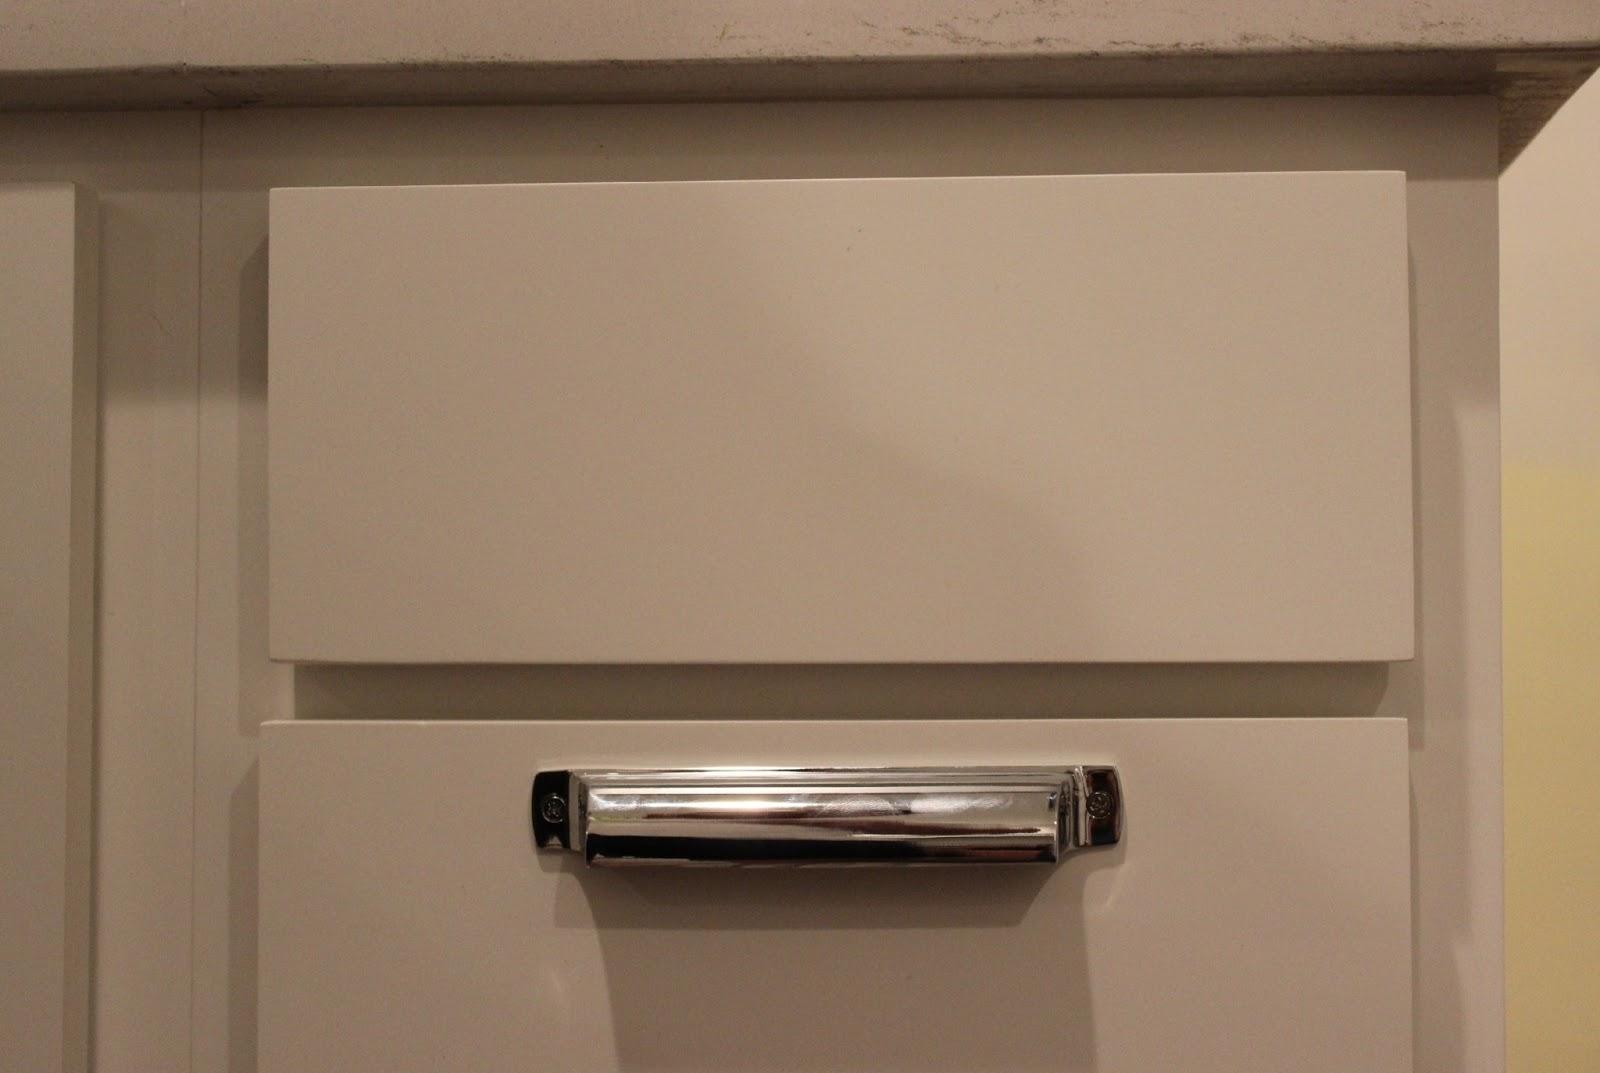 How To Install Kitchen Cabinet Hardware Tutorial - Dream Book Design